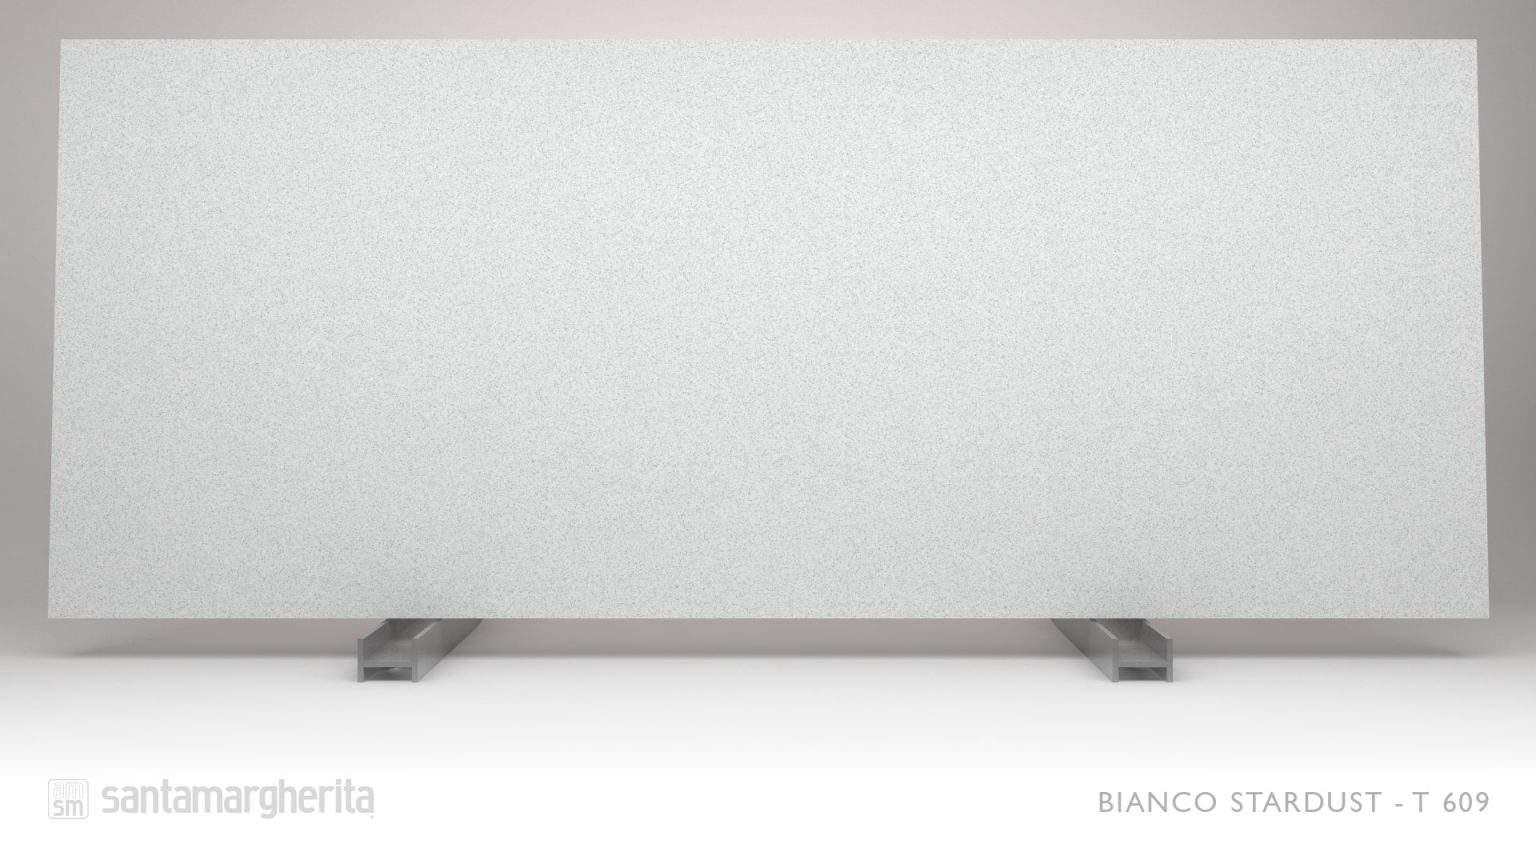 Bianco Stardust SLAB